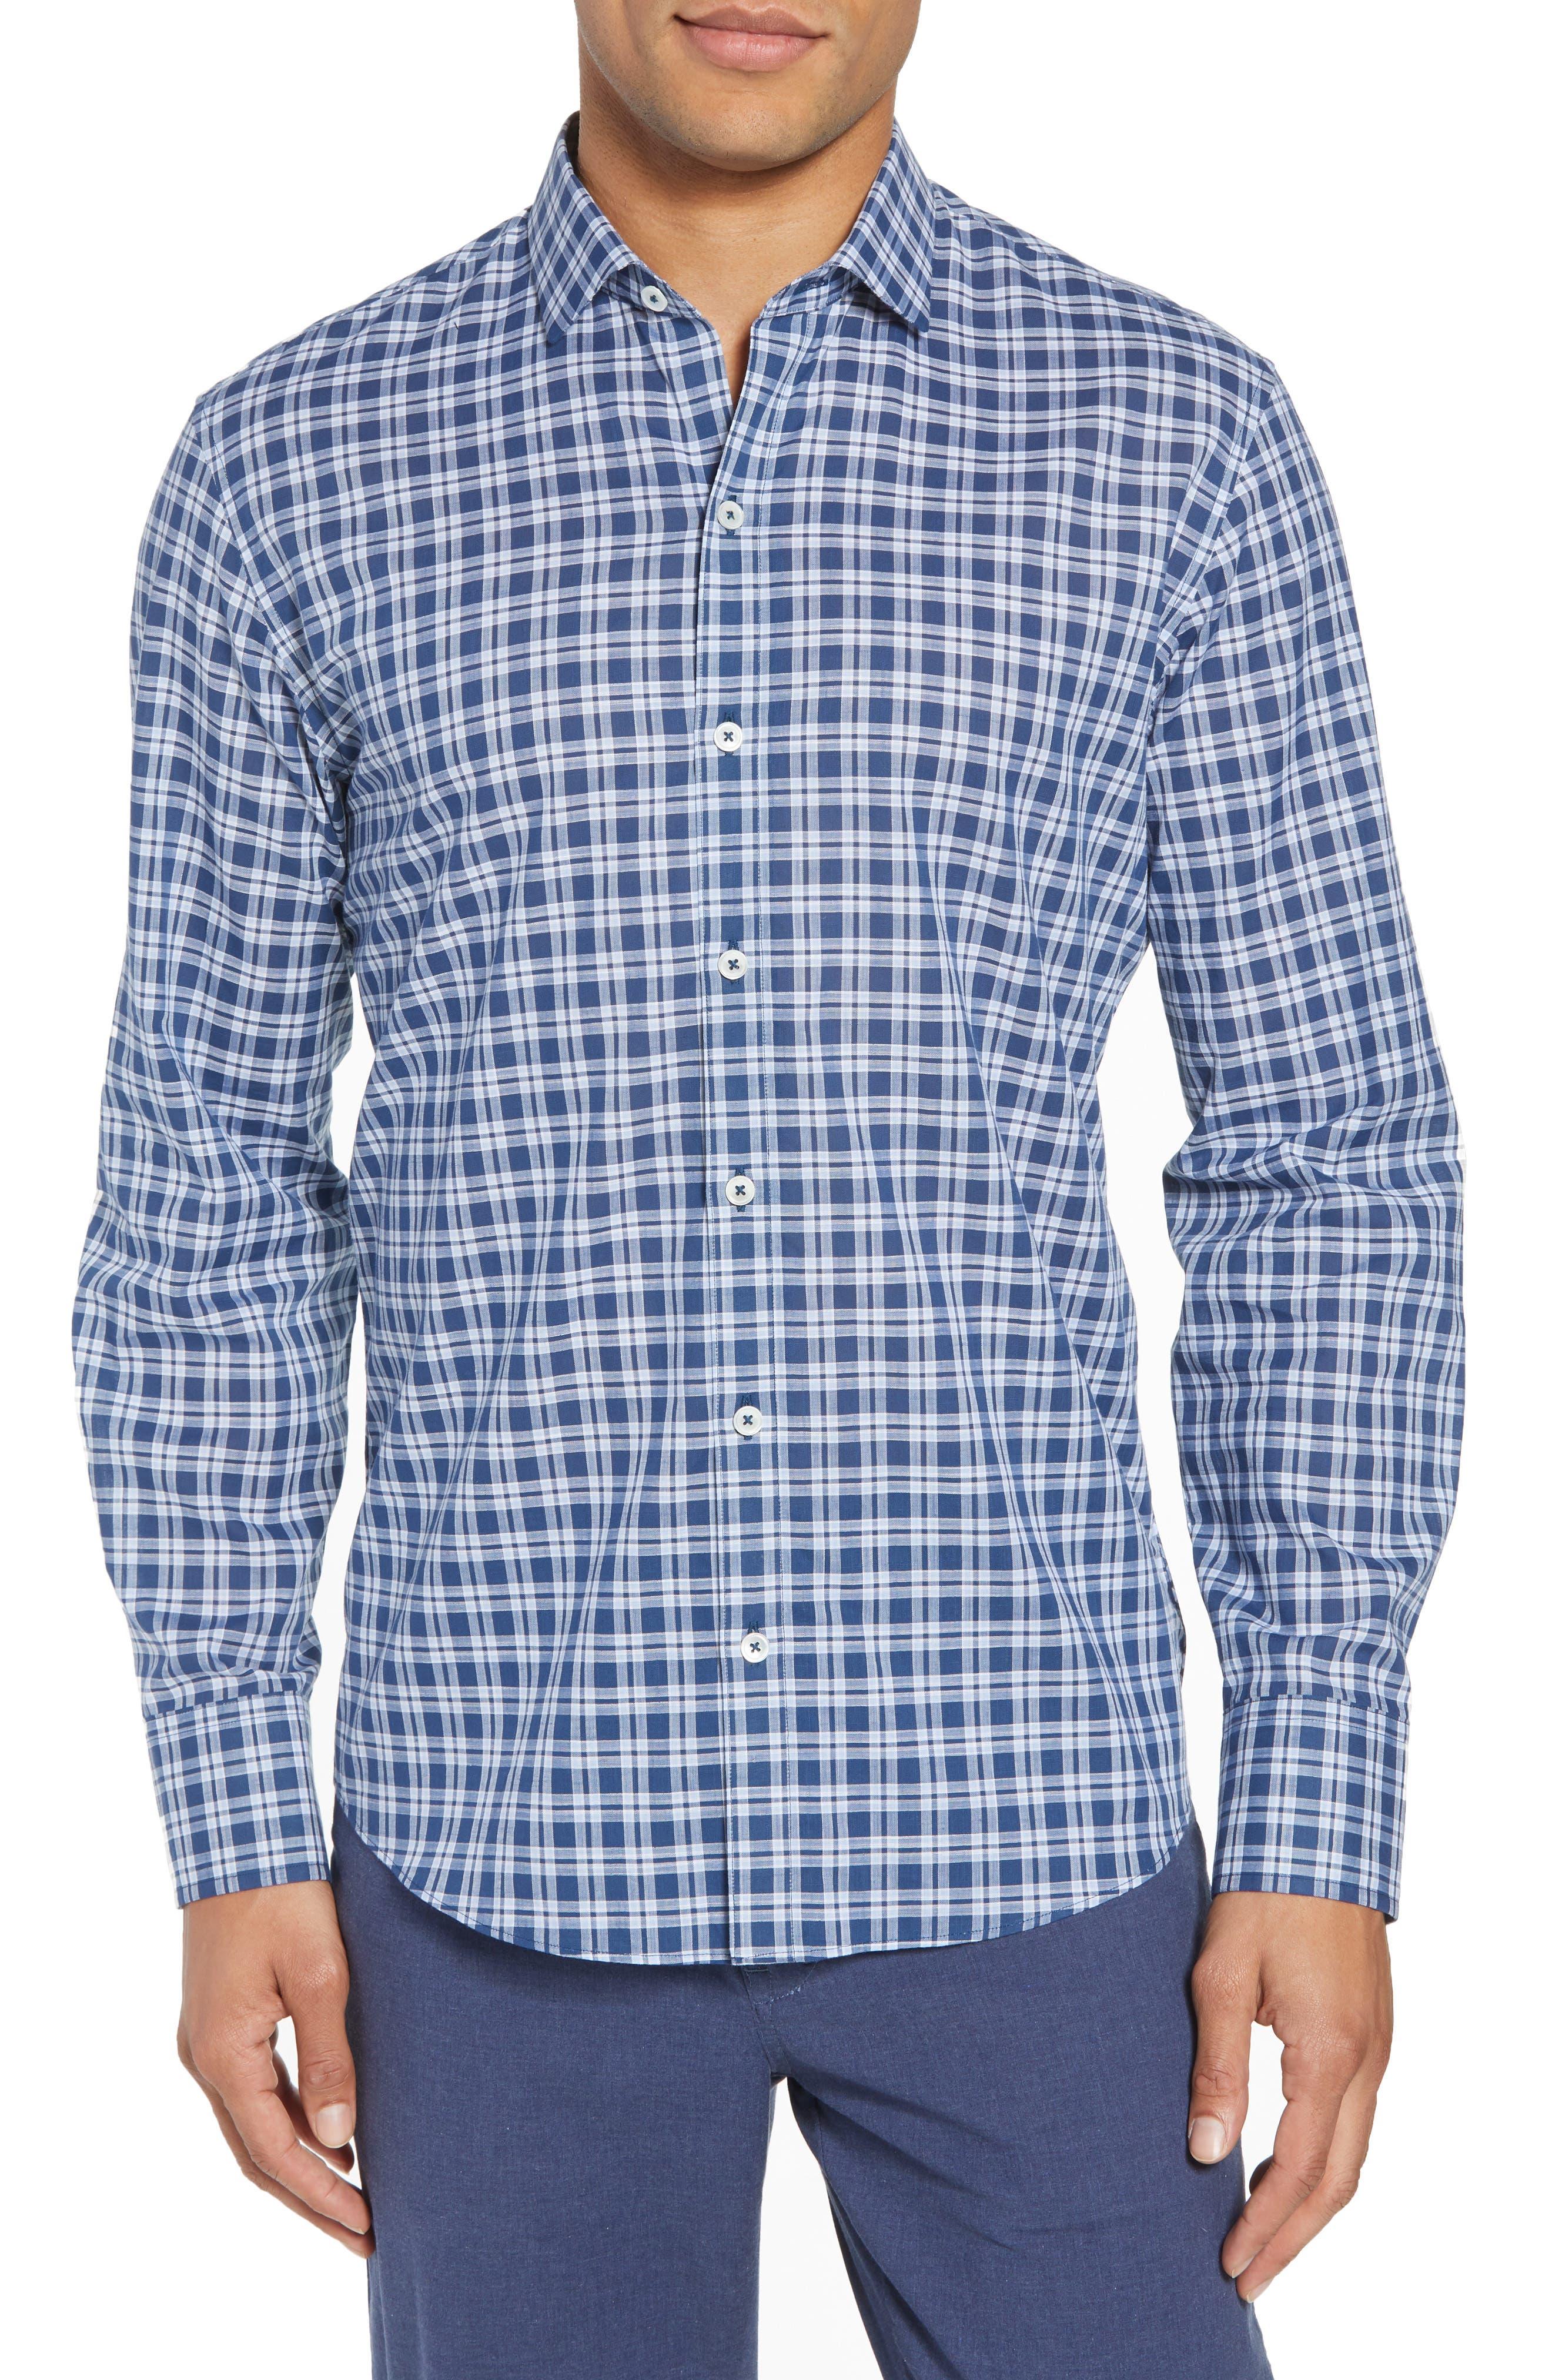 Speer Regular Fit Sport Shirt,                         Main,                         color, 424